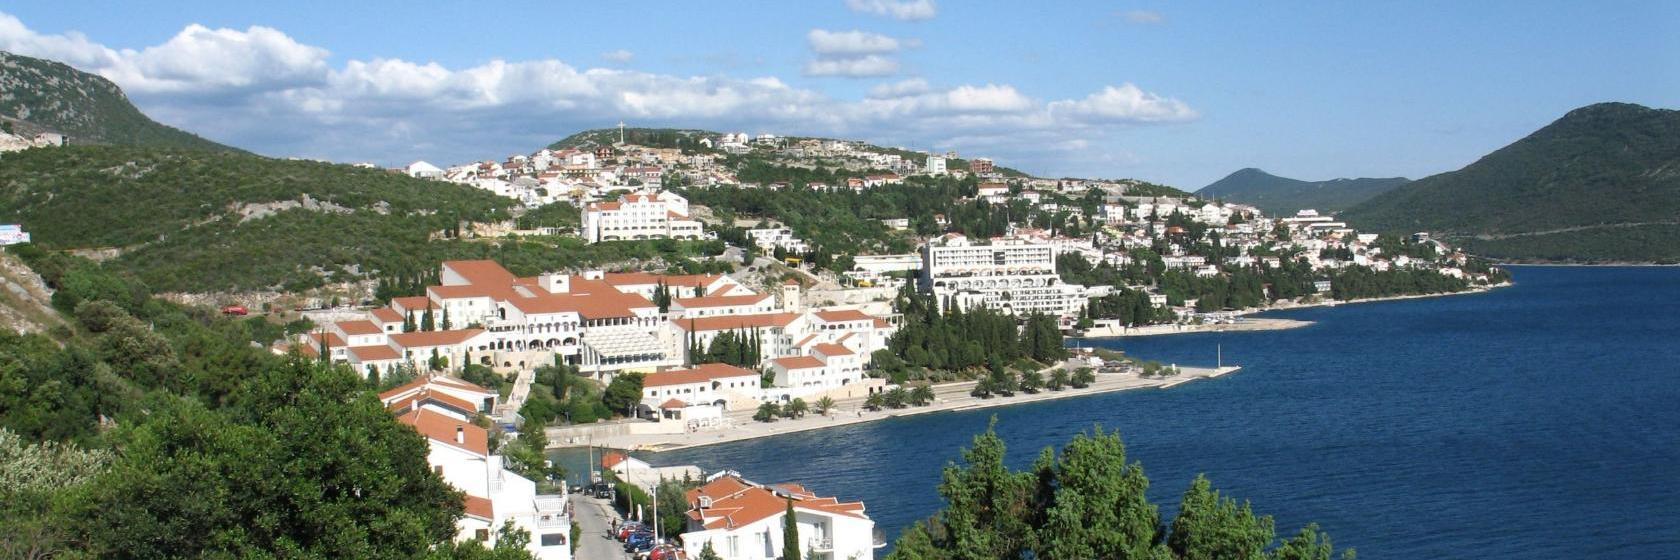 10 najboljih hotela na destinaciji Neum, Bosna i Hercegovina (od RSD 3.292)